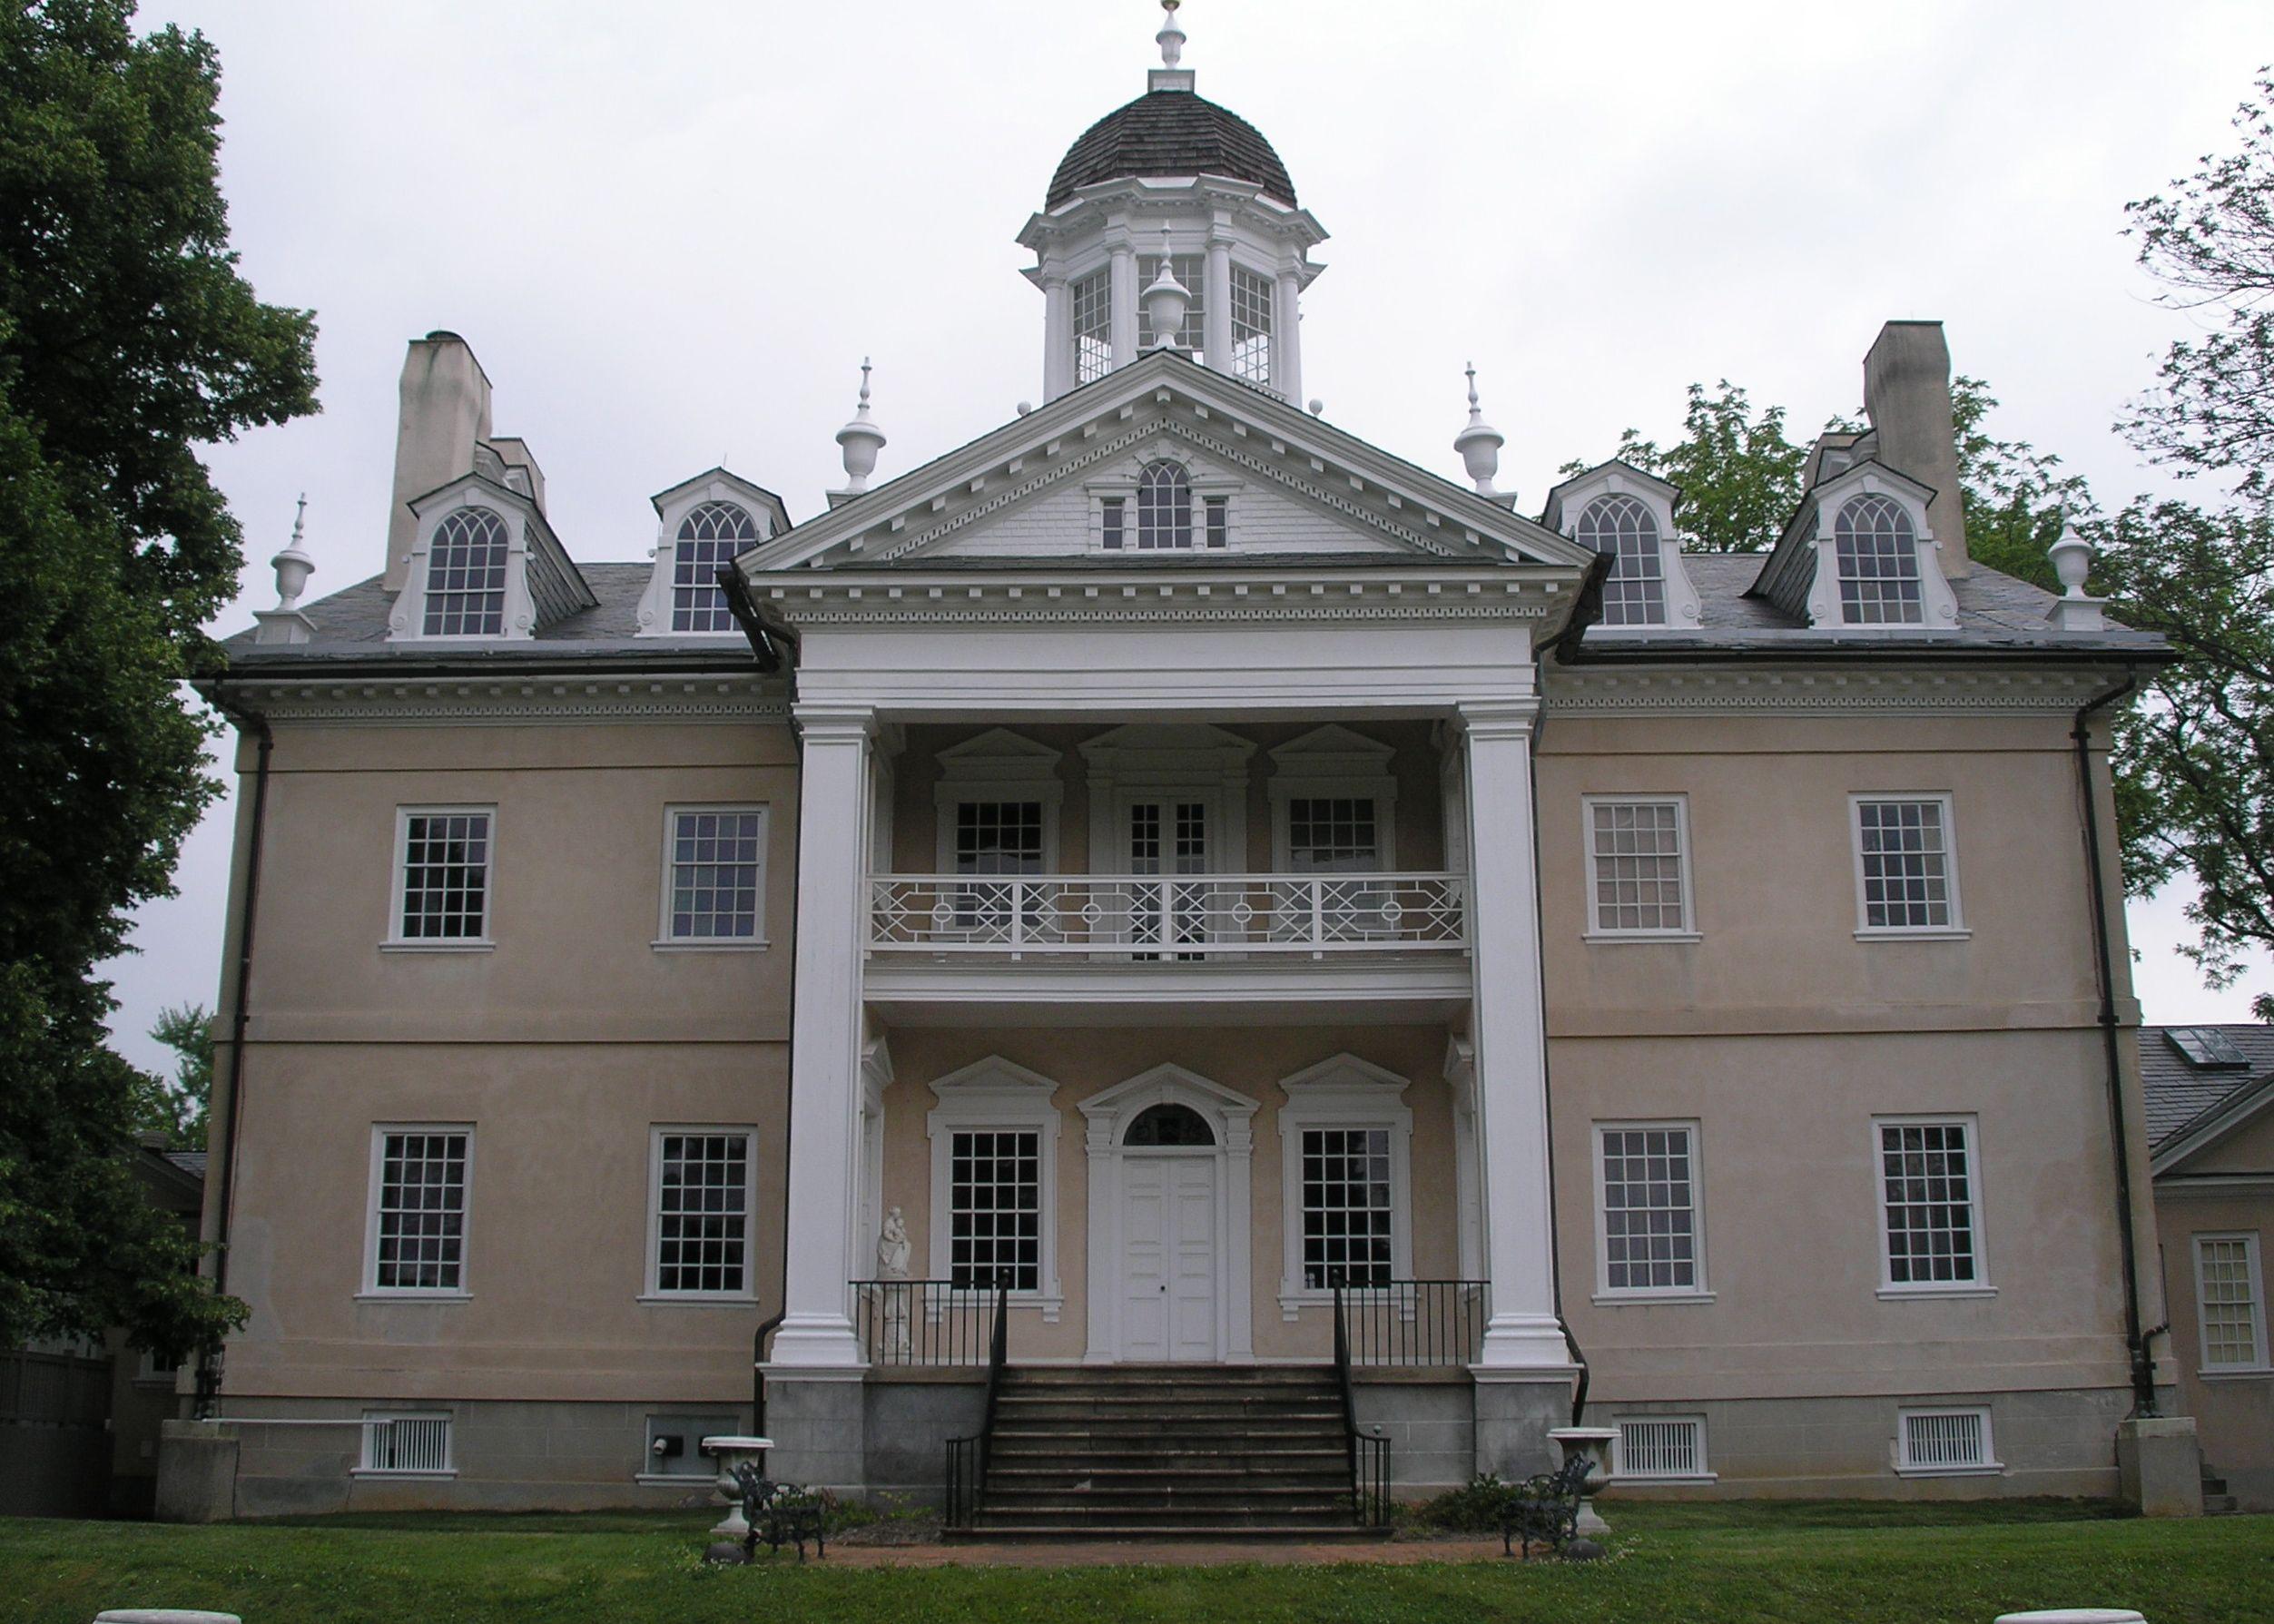 Hampton national historic site - In